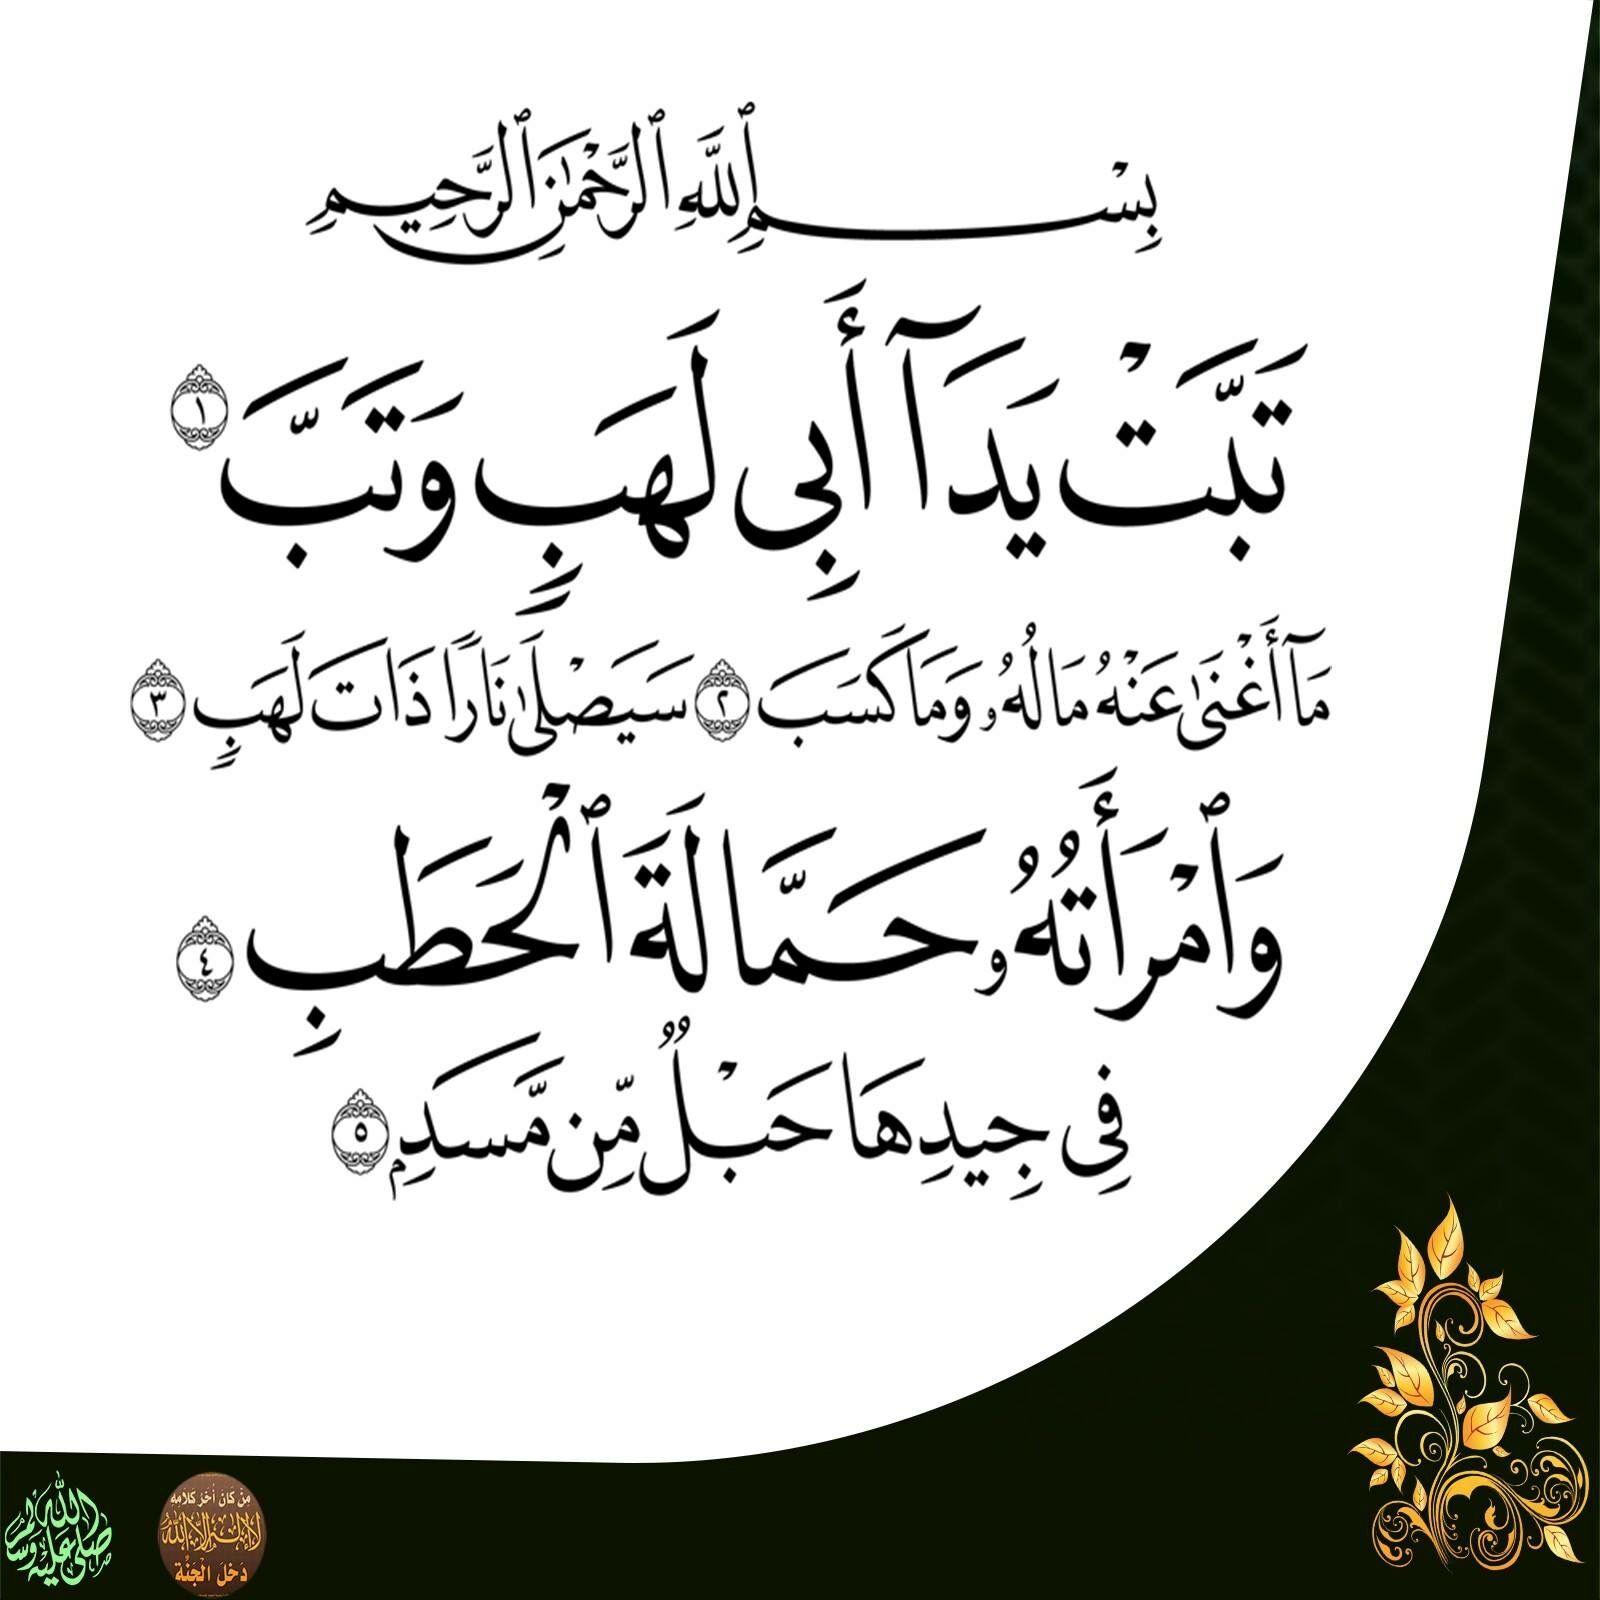 Pin By كتابا متشابها On ١١١ سورة المسد Quran Koran Quran In English